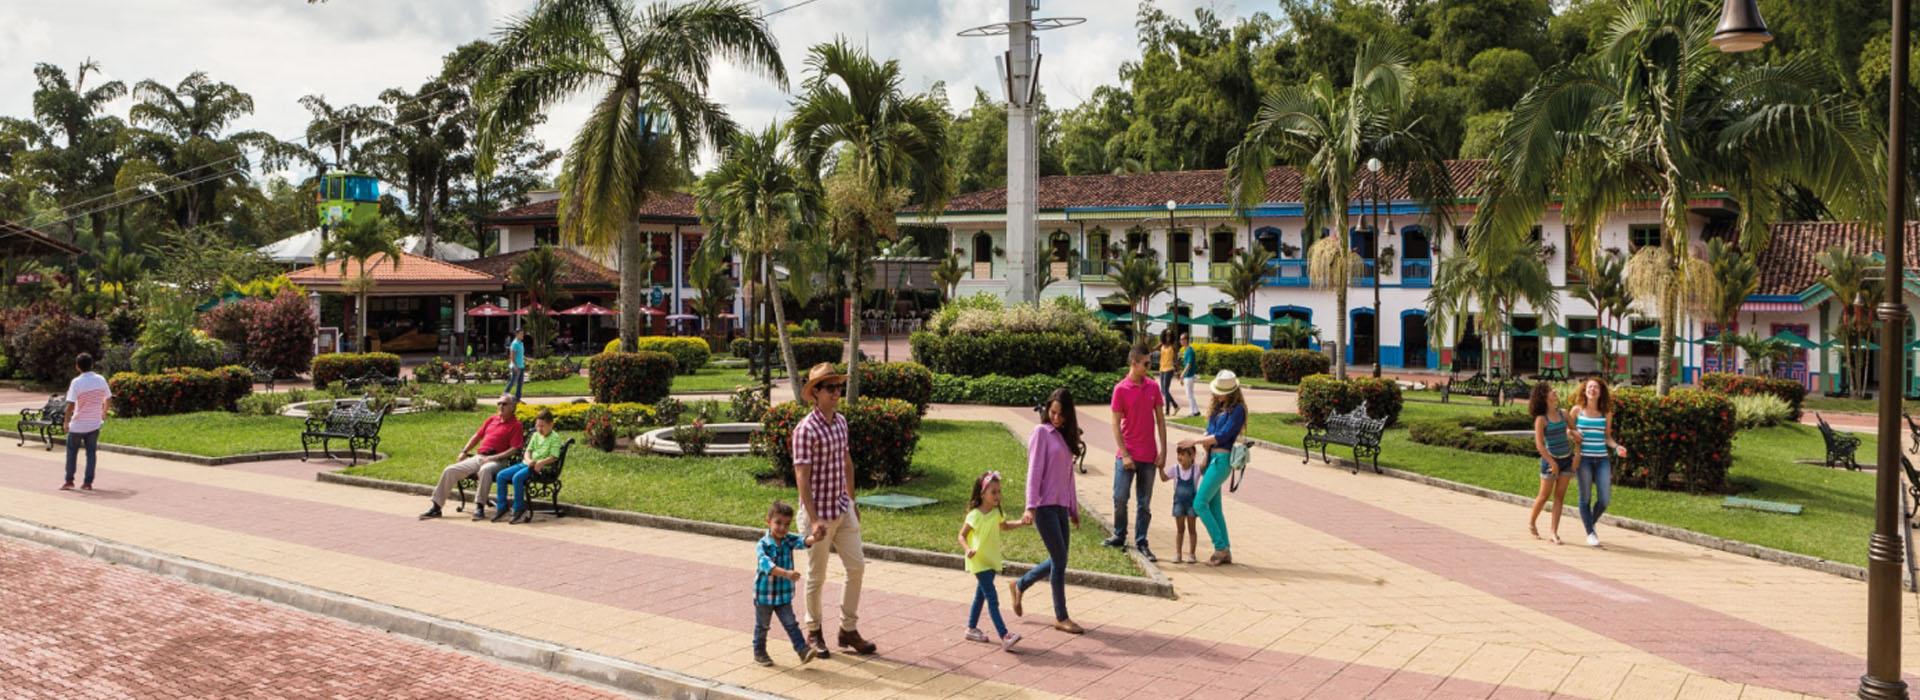 plaza-1